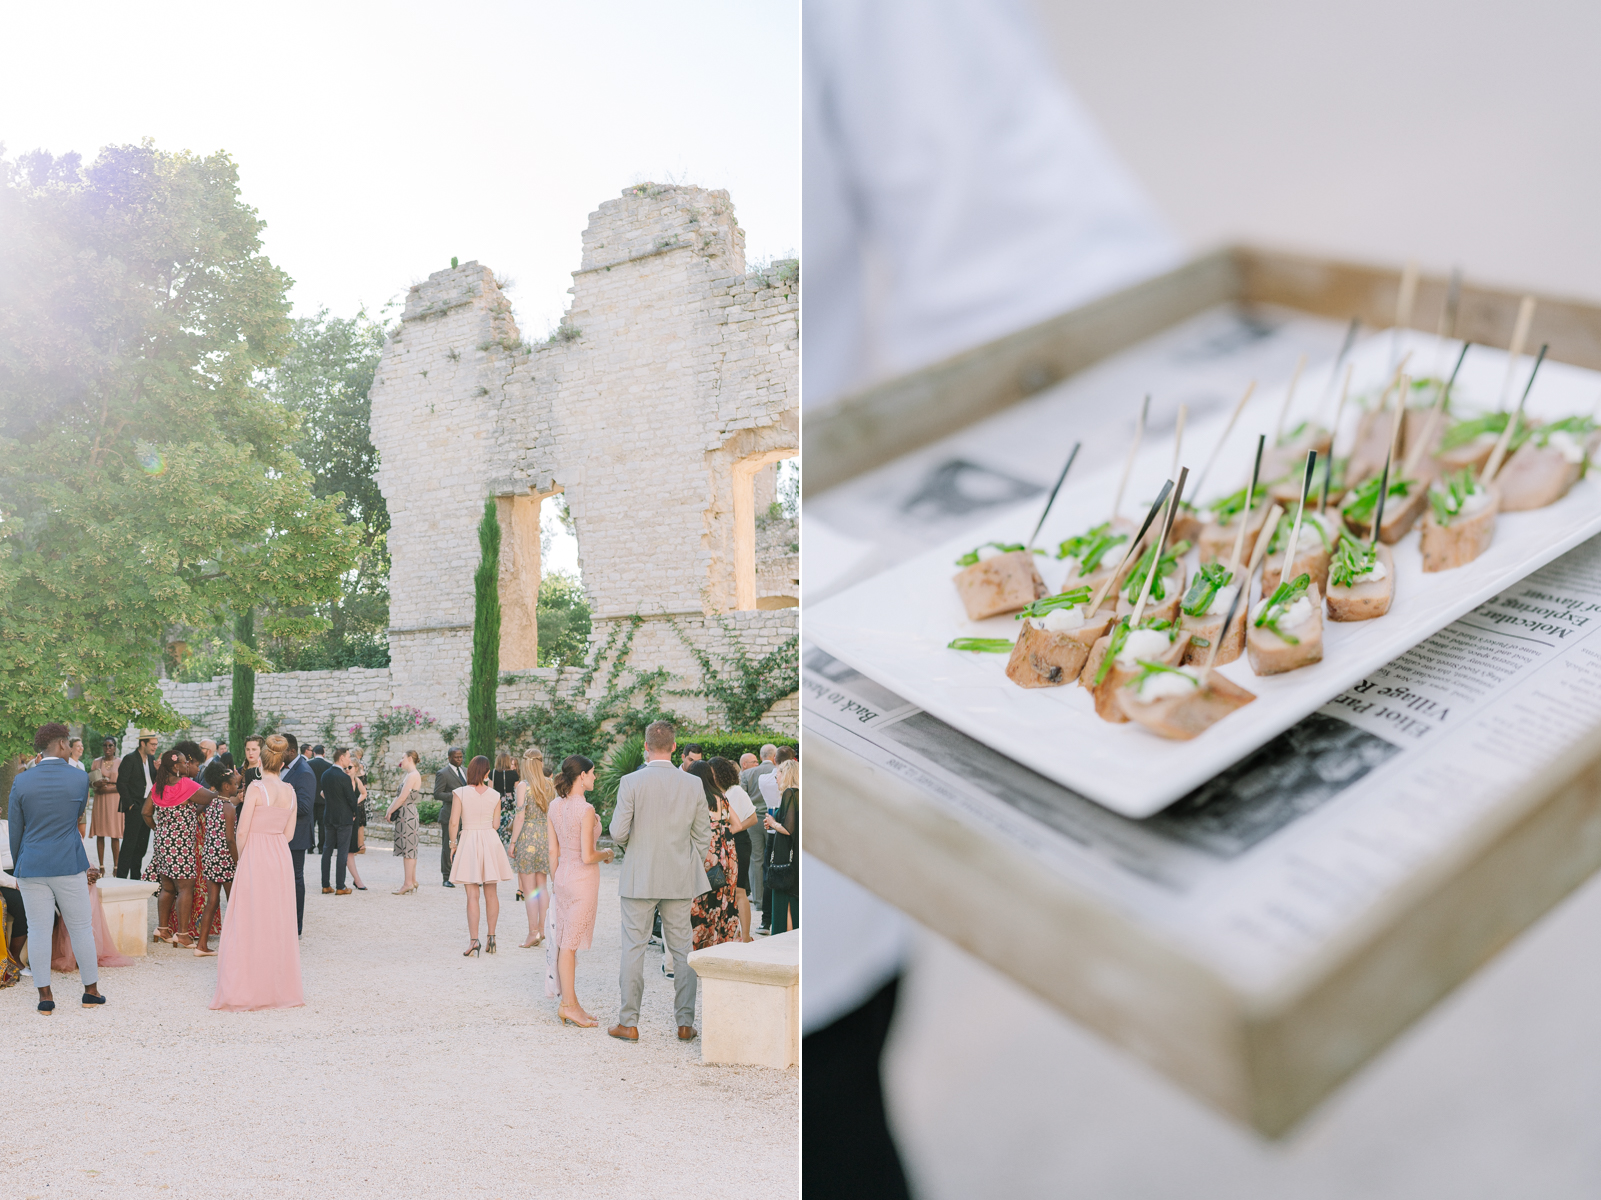 Boheme-Moon-Photography-Wedding-in-Provence-France_018.jpg